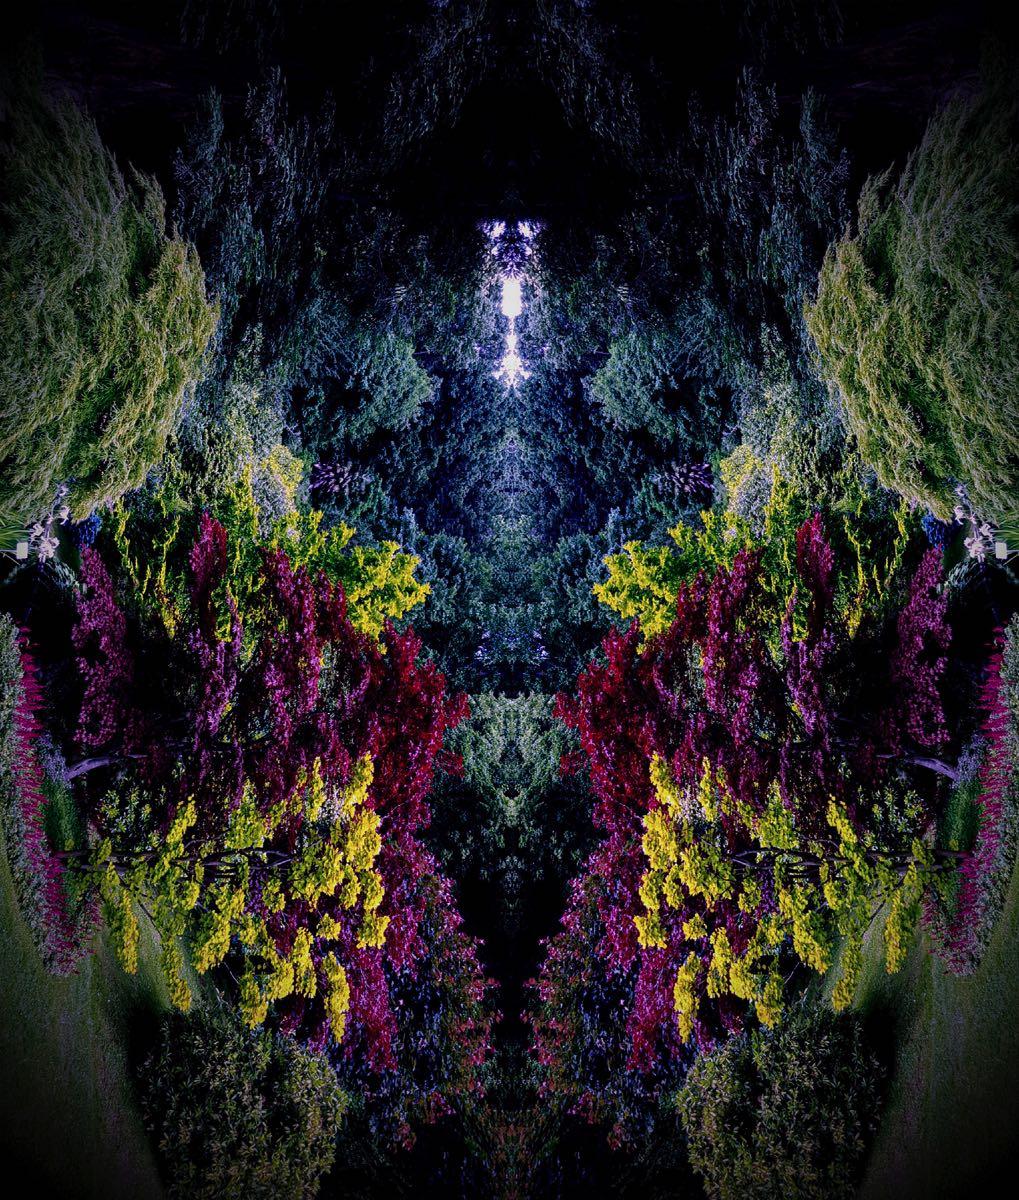 Subconscious - Tree Creatures #7 (40x40 cm) - Print on cotton paper 2020